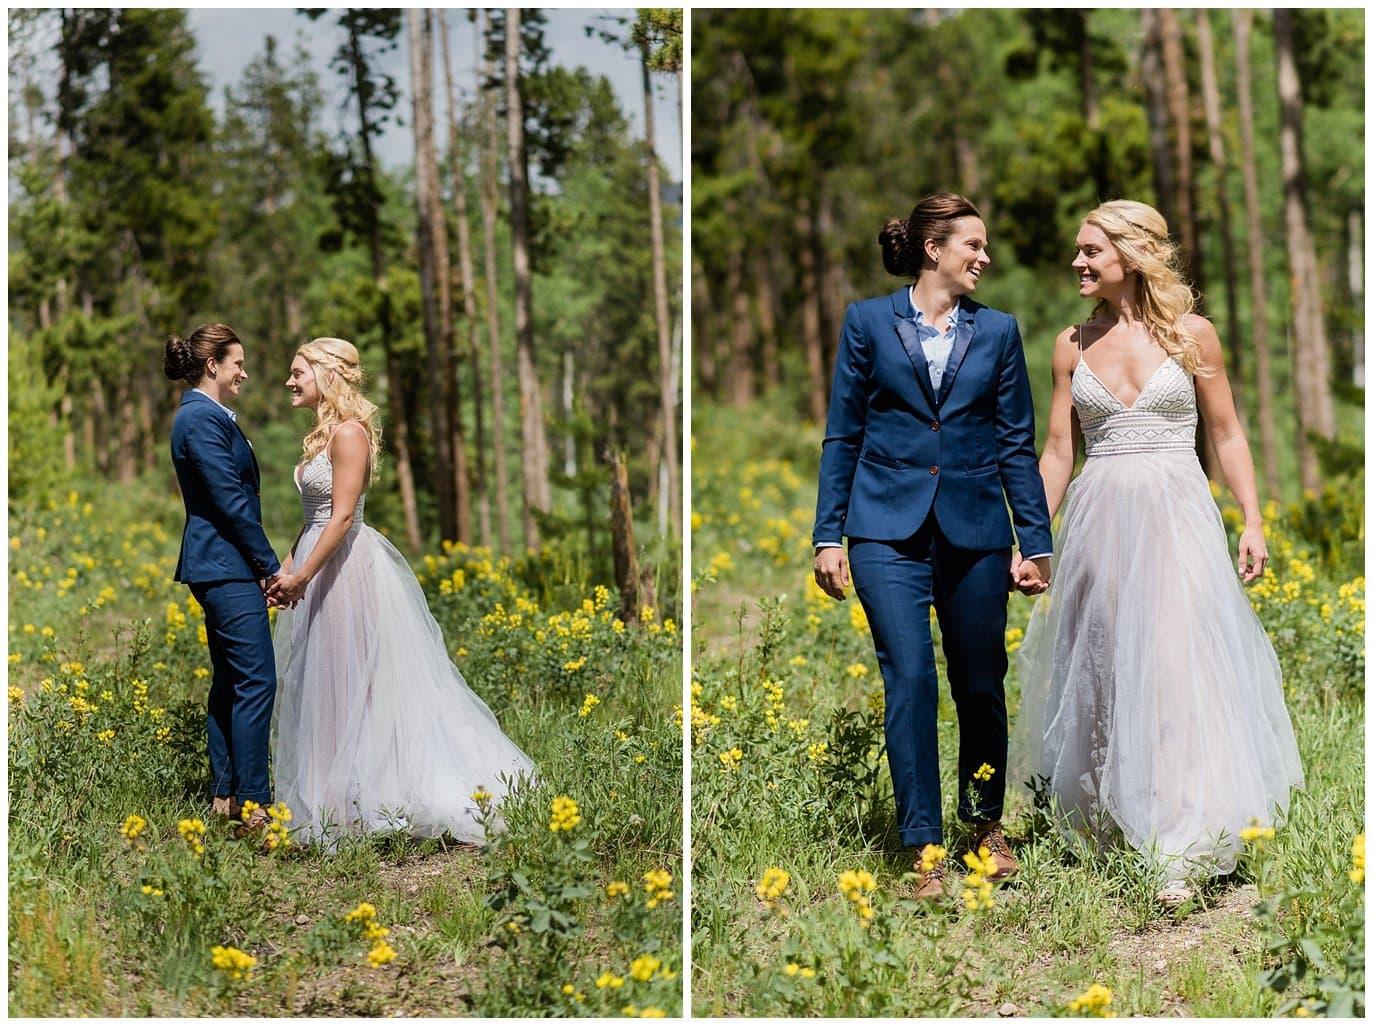 Winter Park intimate wedding photo